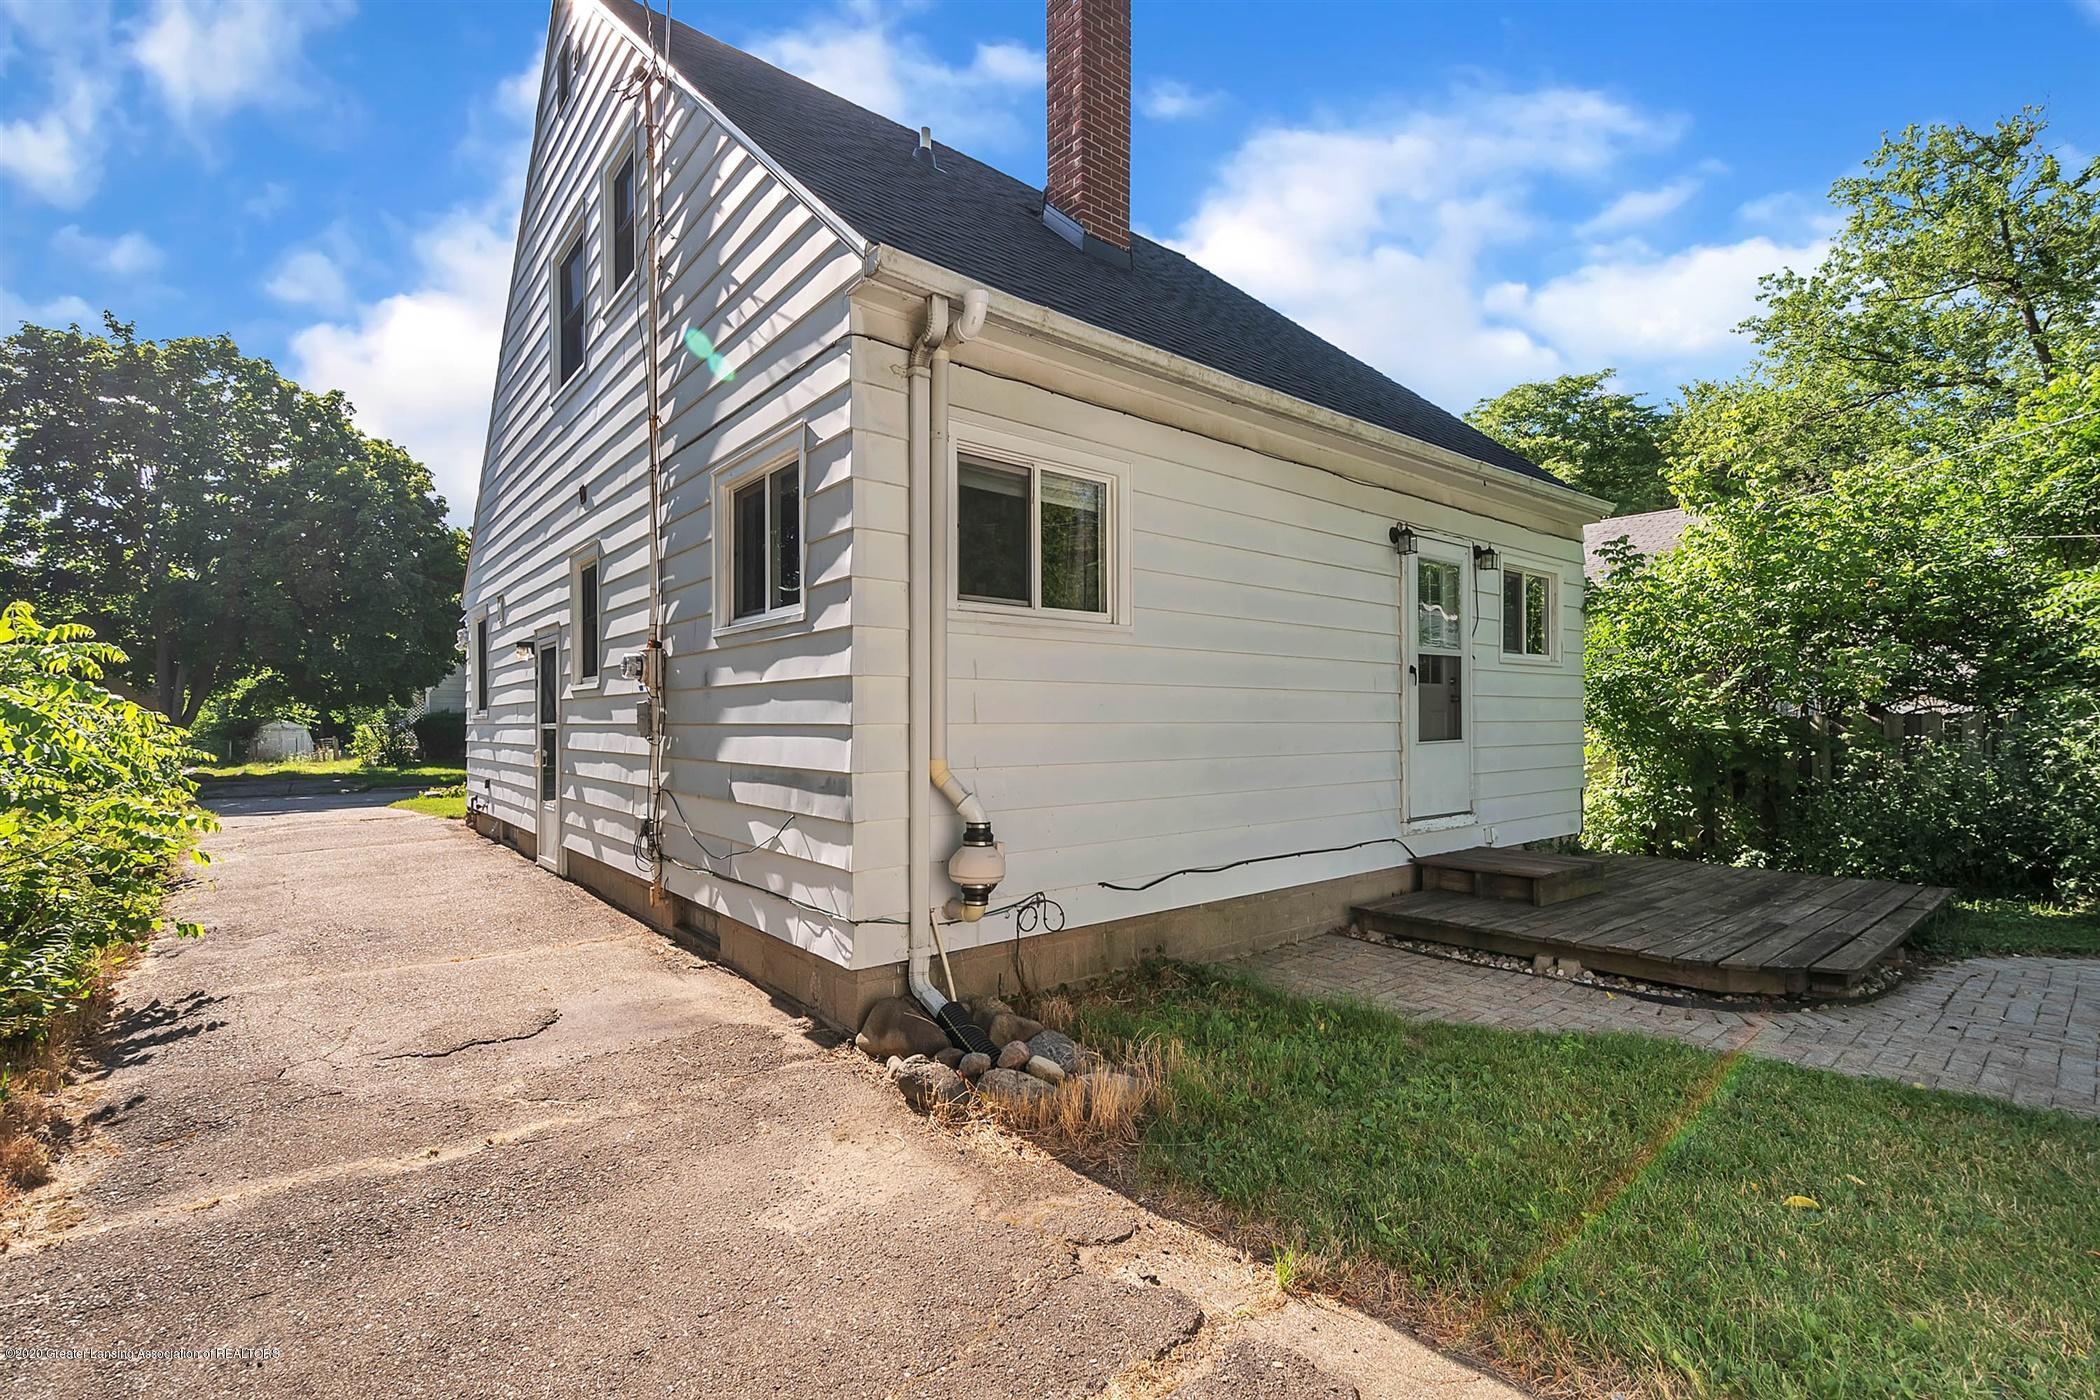 580 Lexington Ave - 39-580 Lexington Ave-WindowStill-Re - 38